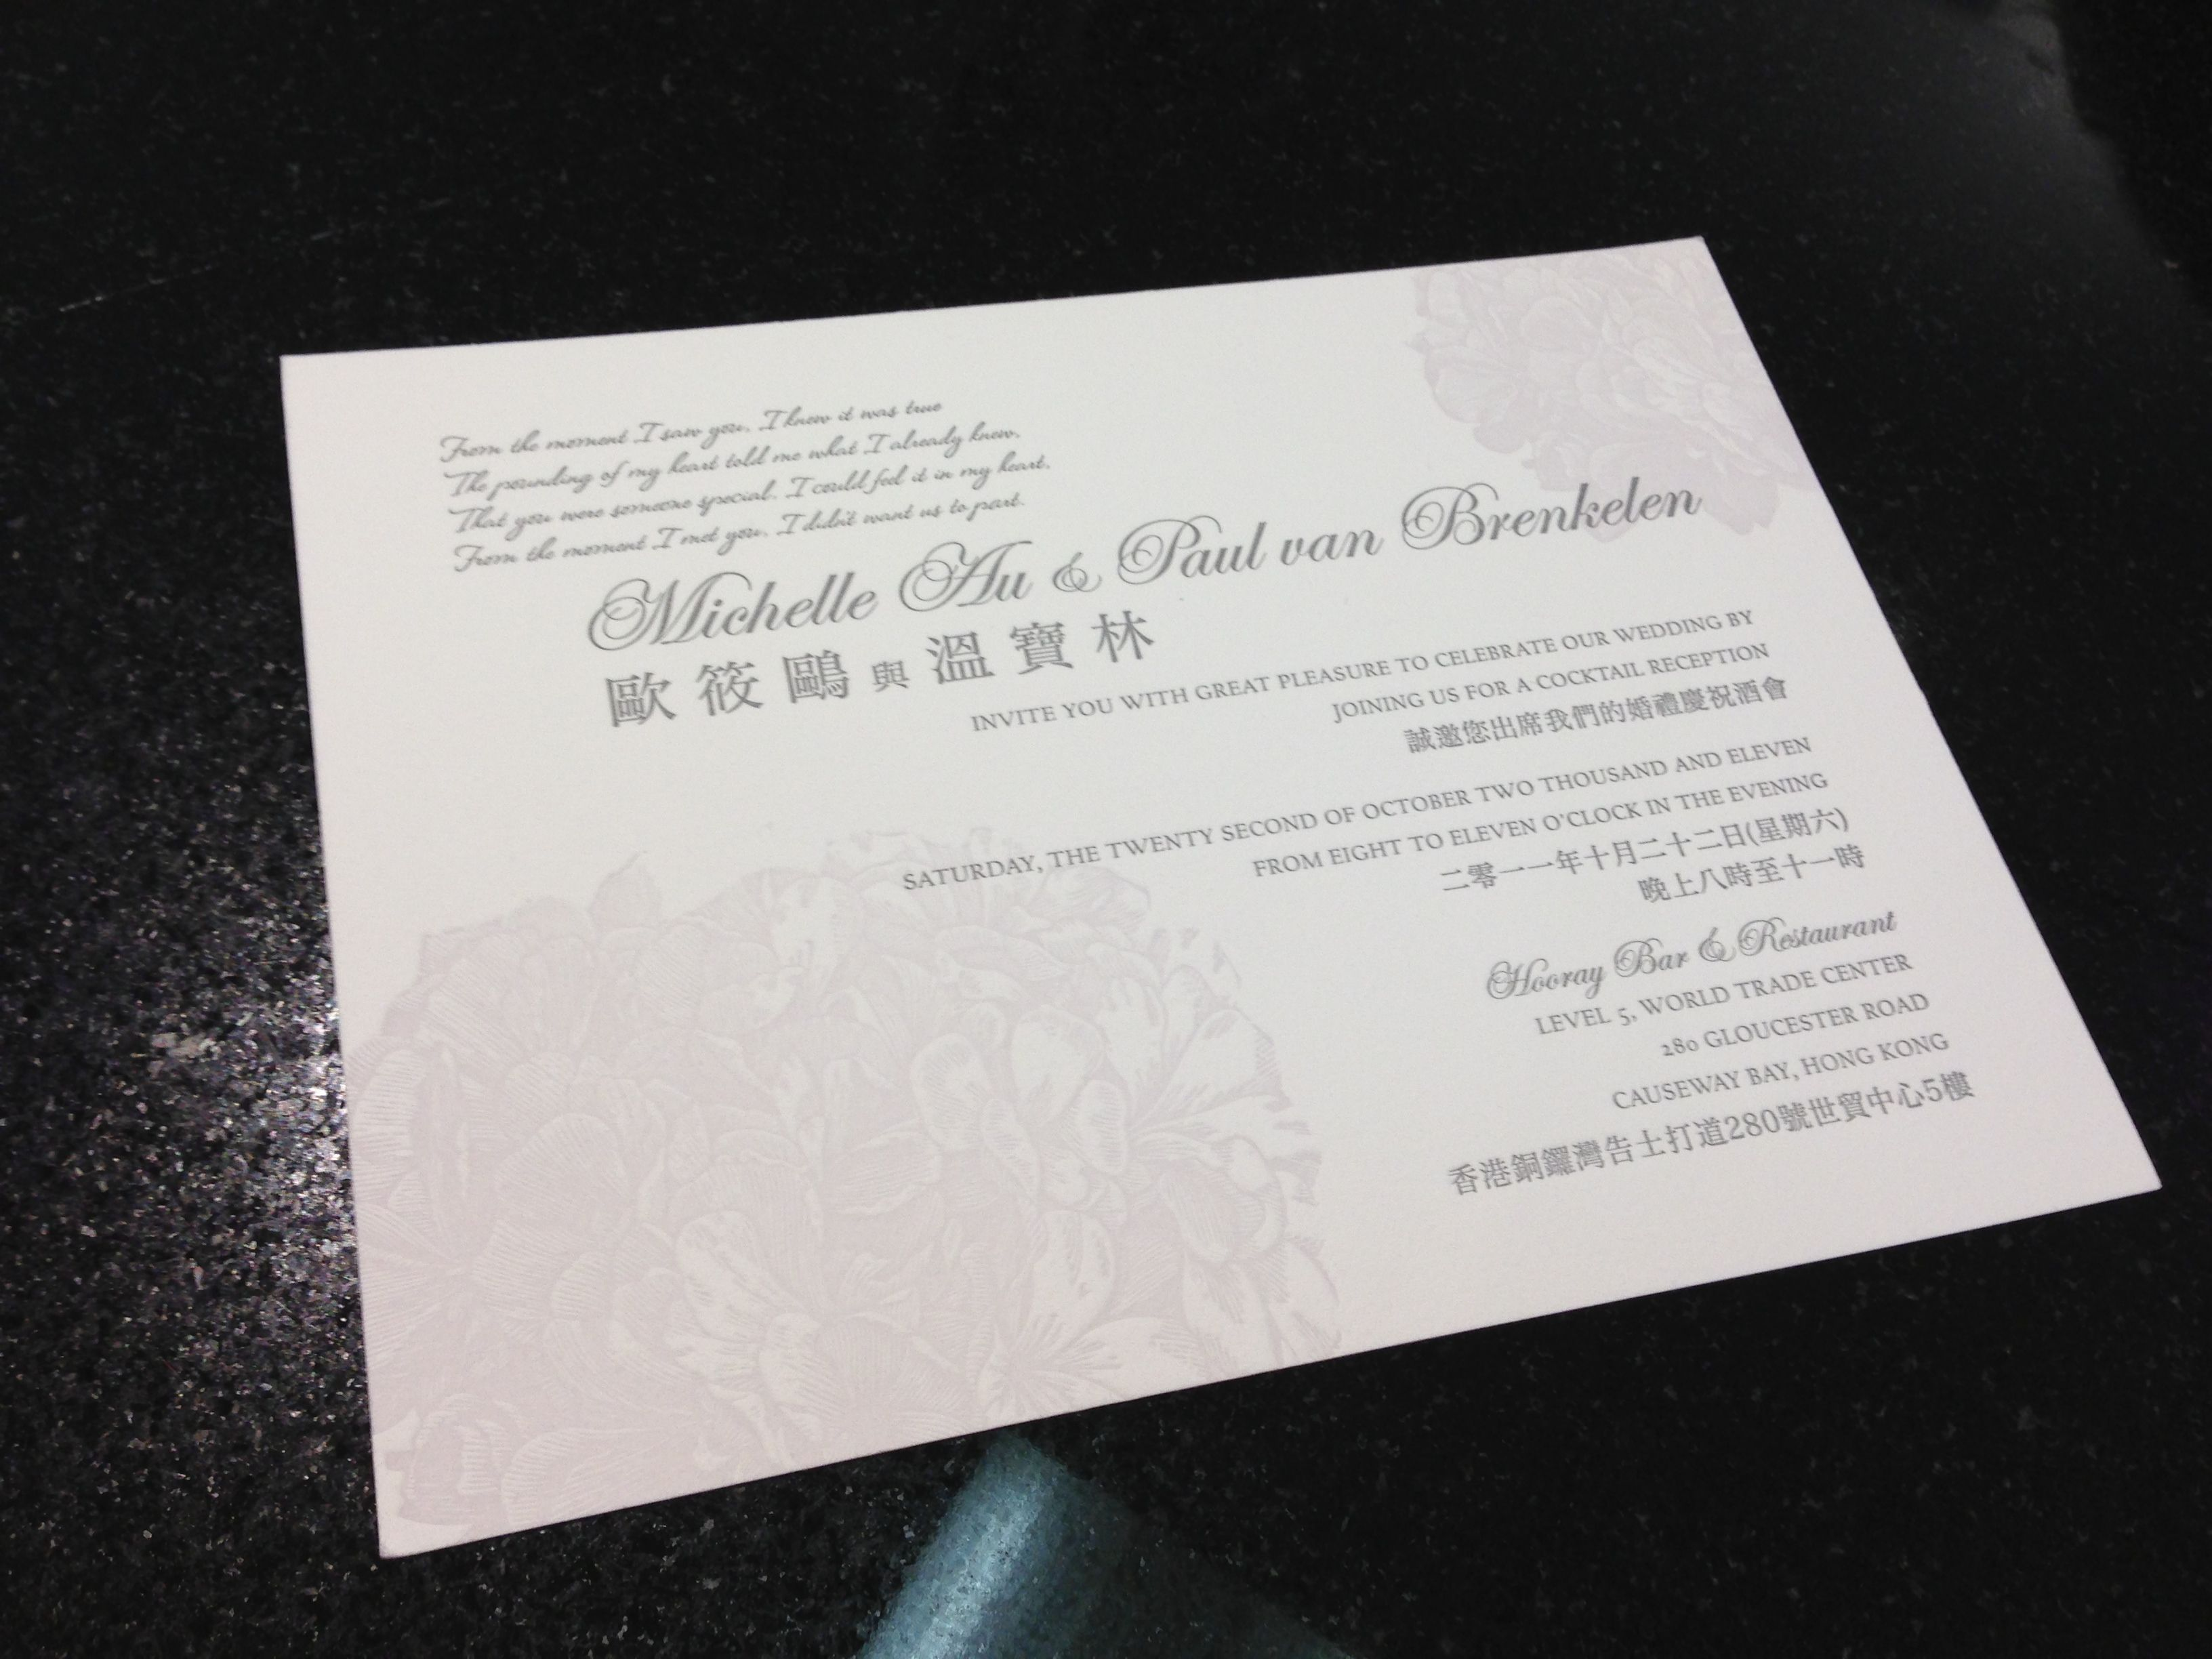 dual language wedding invitation featuring chinese and With wedding invitations dual language